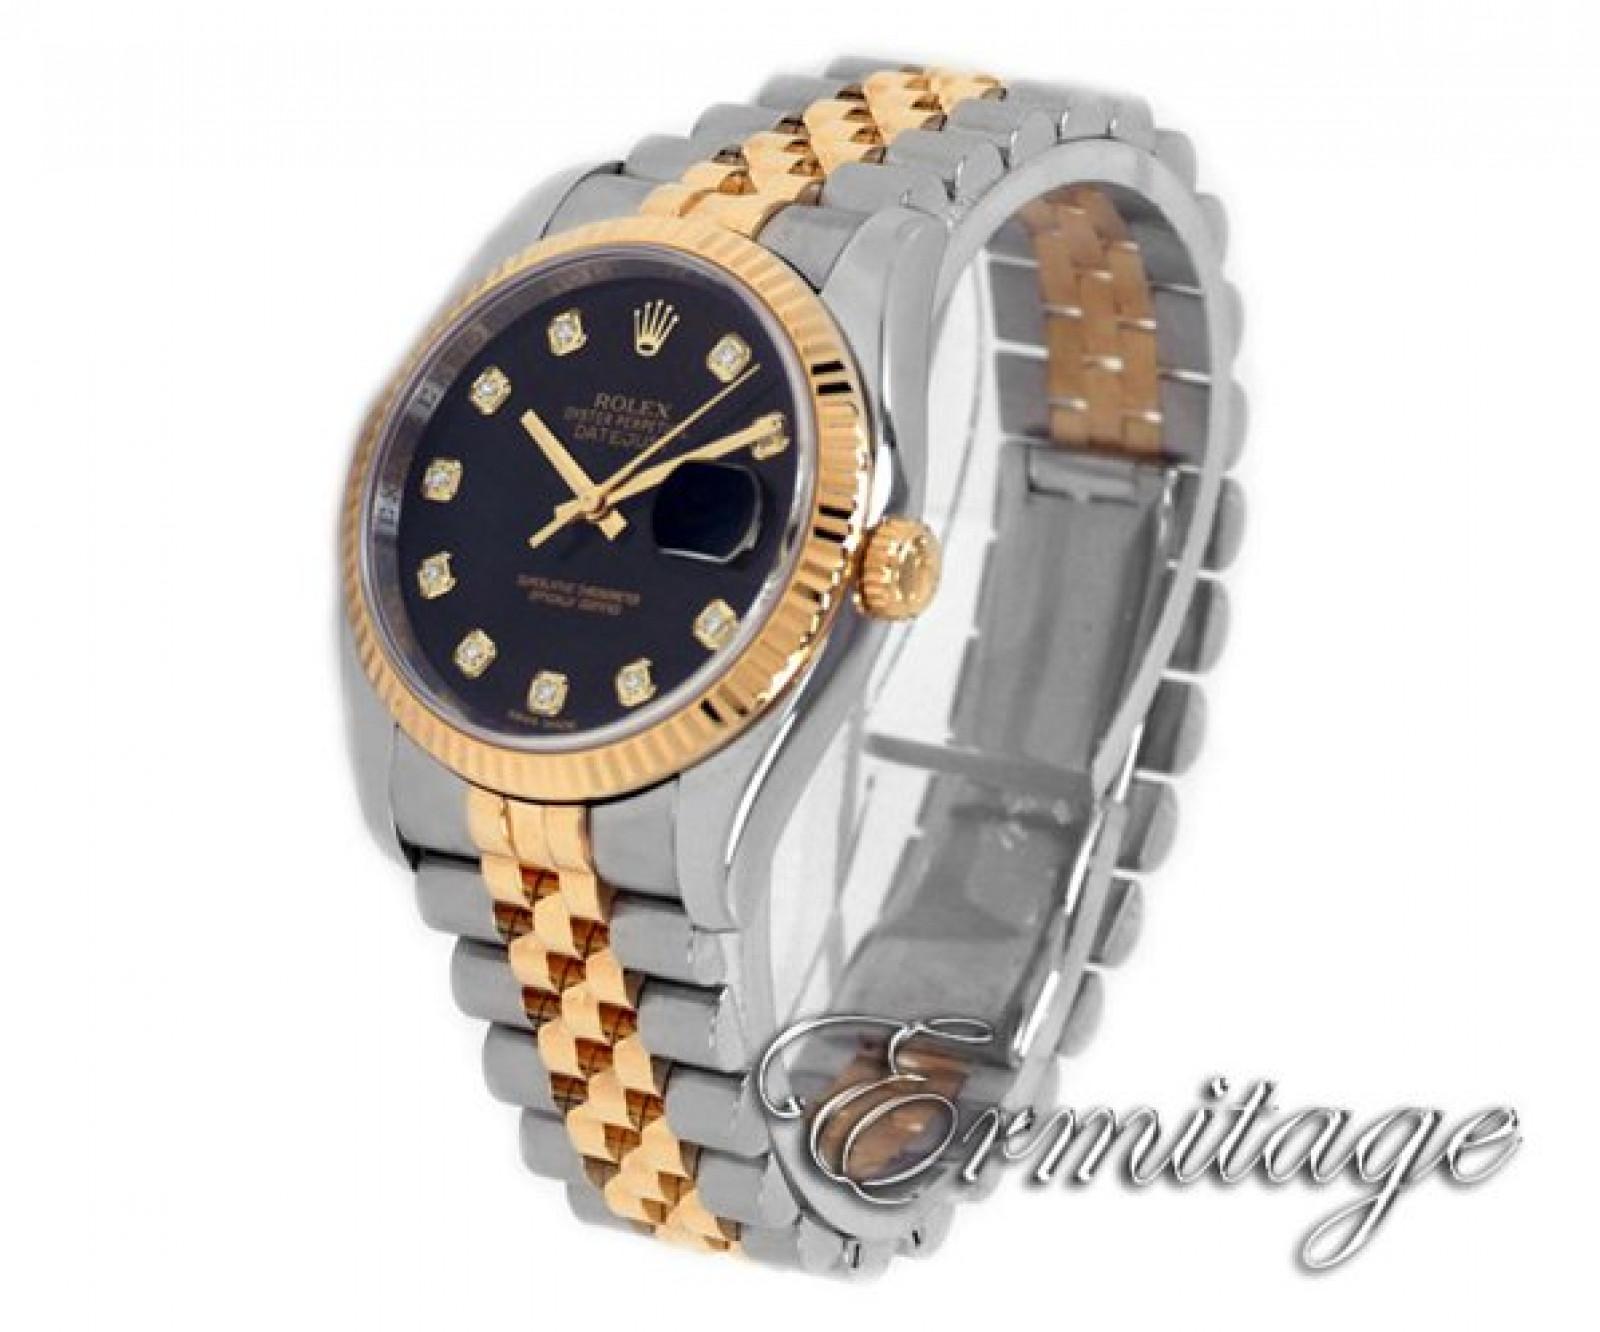 Diamond Dial Rolex Datejust with Diamonds Ref 116233